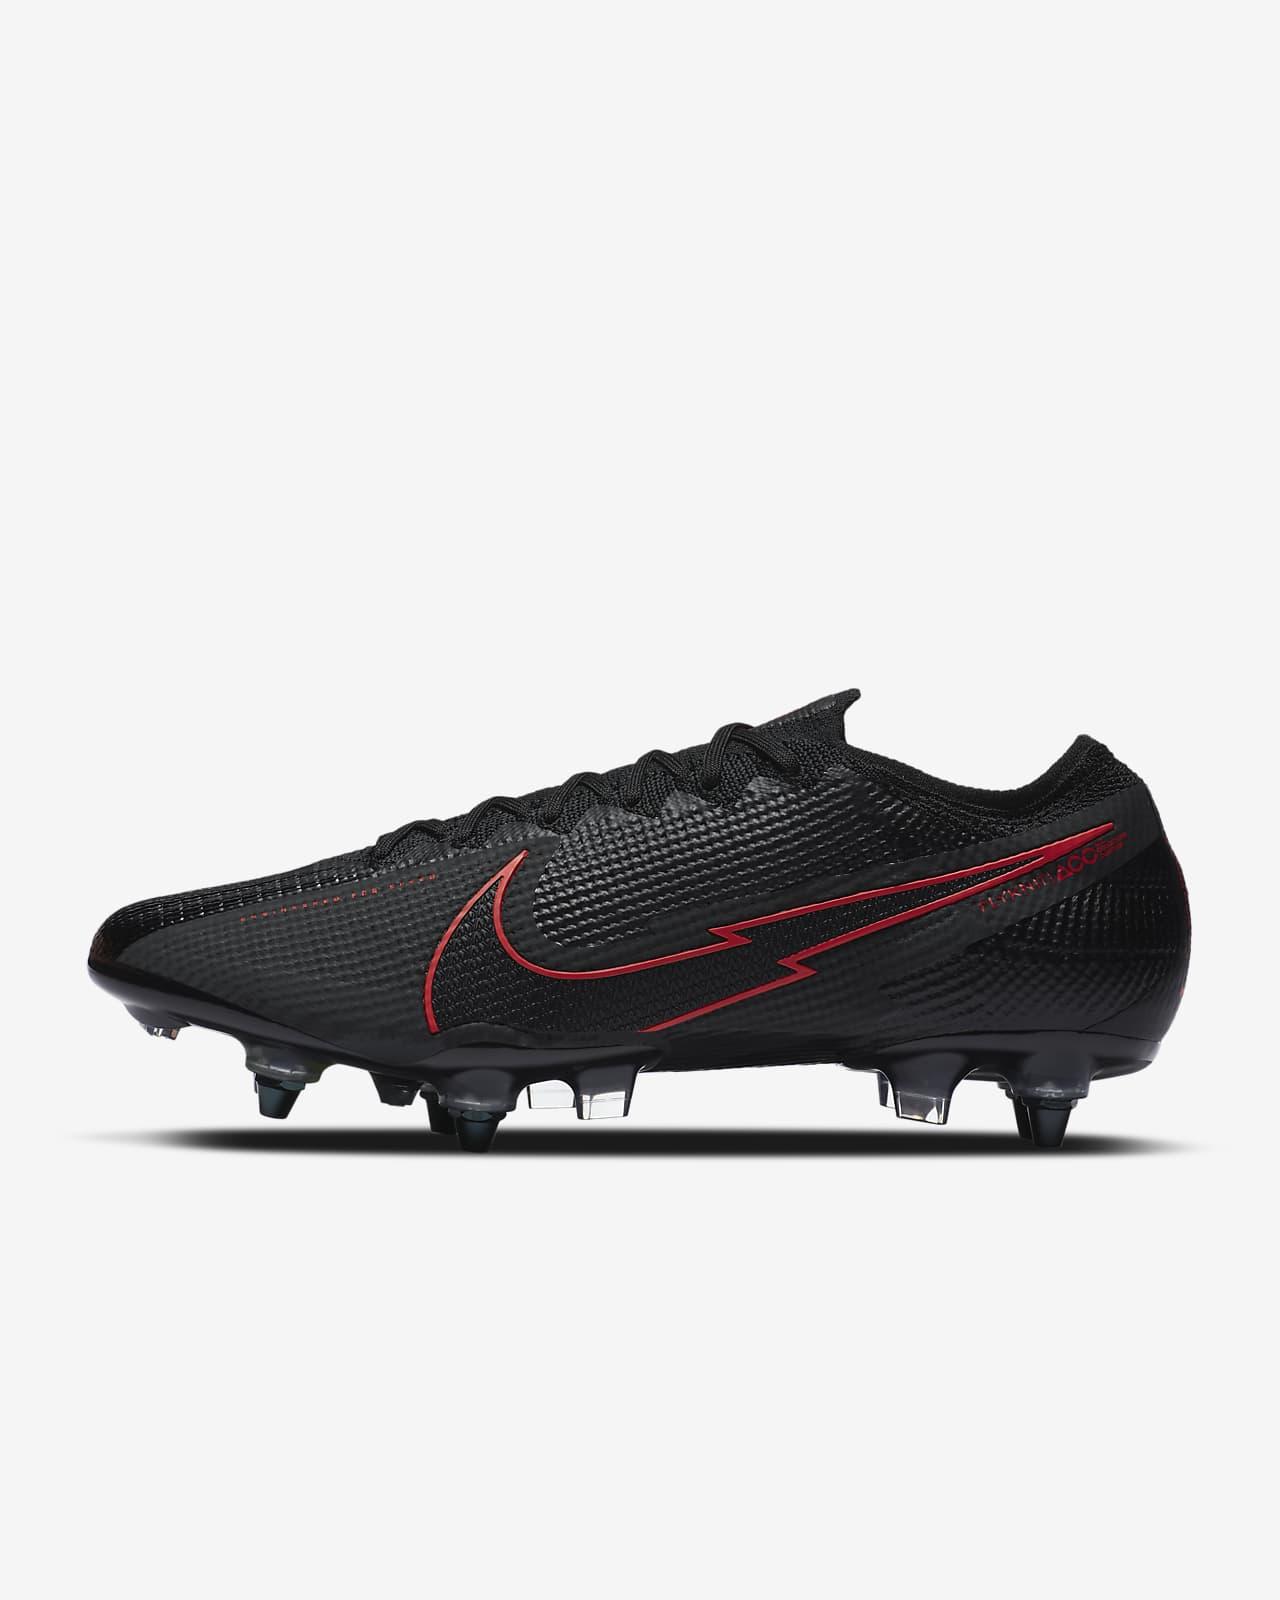 Nike Mercurial Vapor 13 Elite SG-PRO Anti-Clog Traction Soft-Ground Football Boot